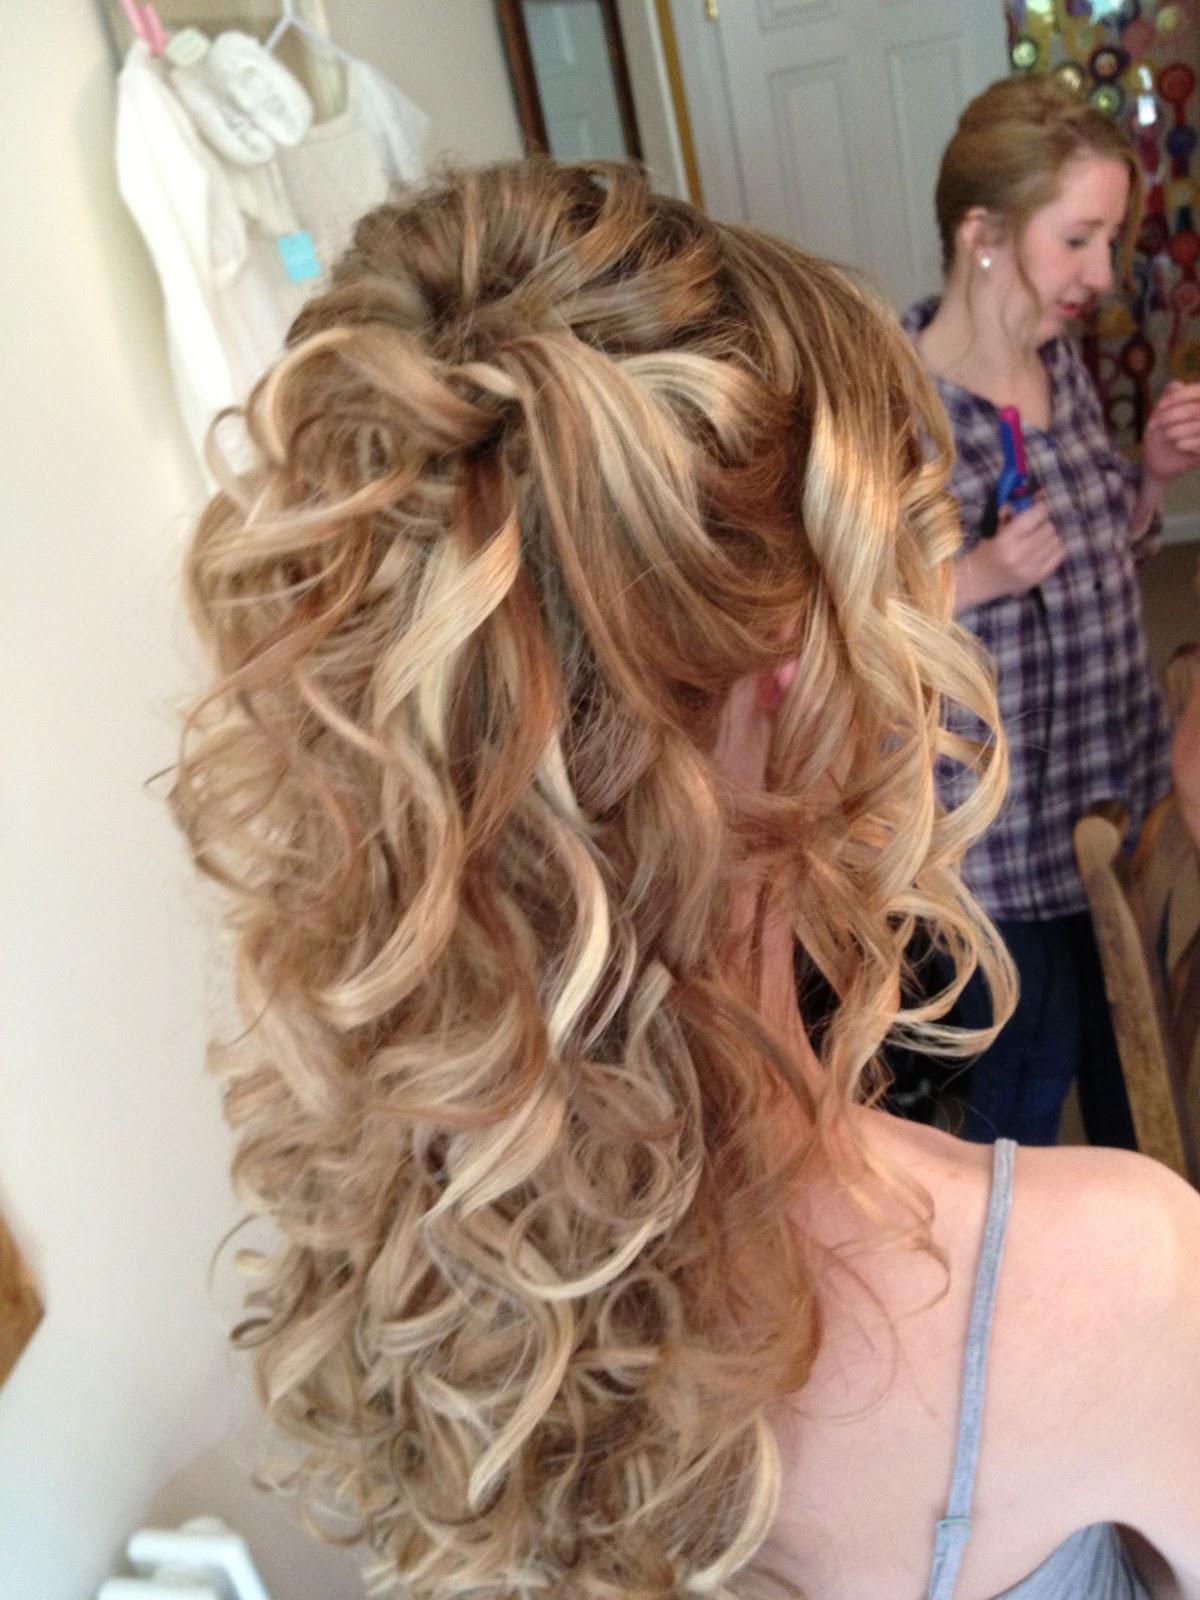 ghd curls hairstyles penkulandbankscouk